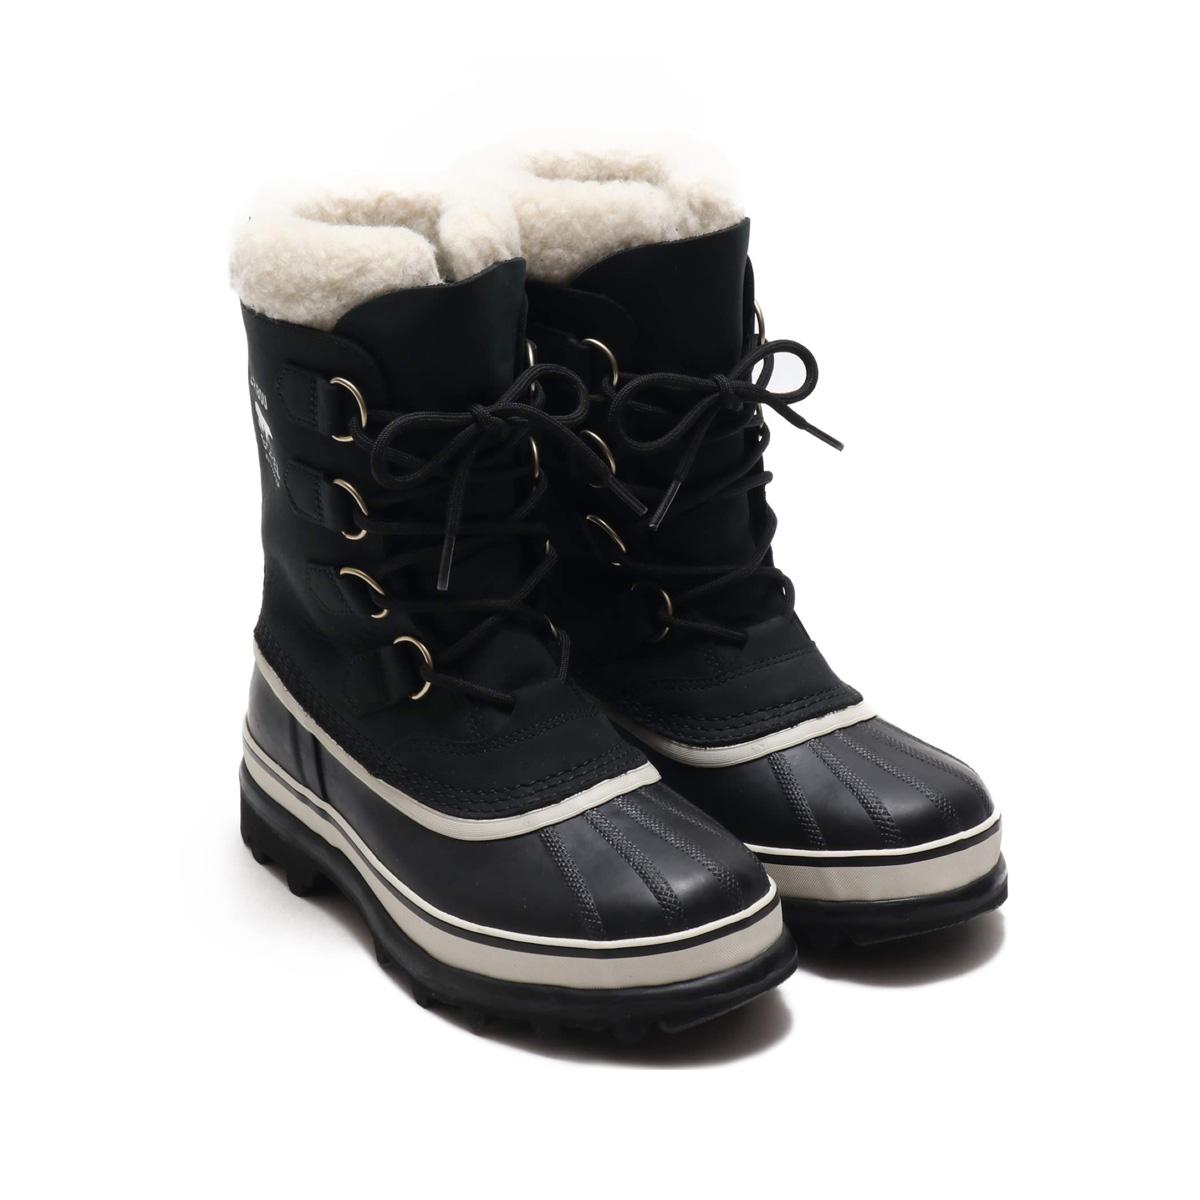 SOREL CARIBOU(ソレル カリブー)BLACK STONE【メンズ レディース ブーツ】18FW-I